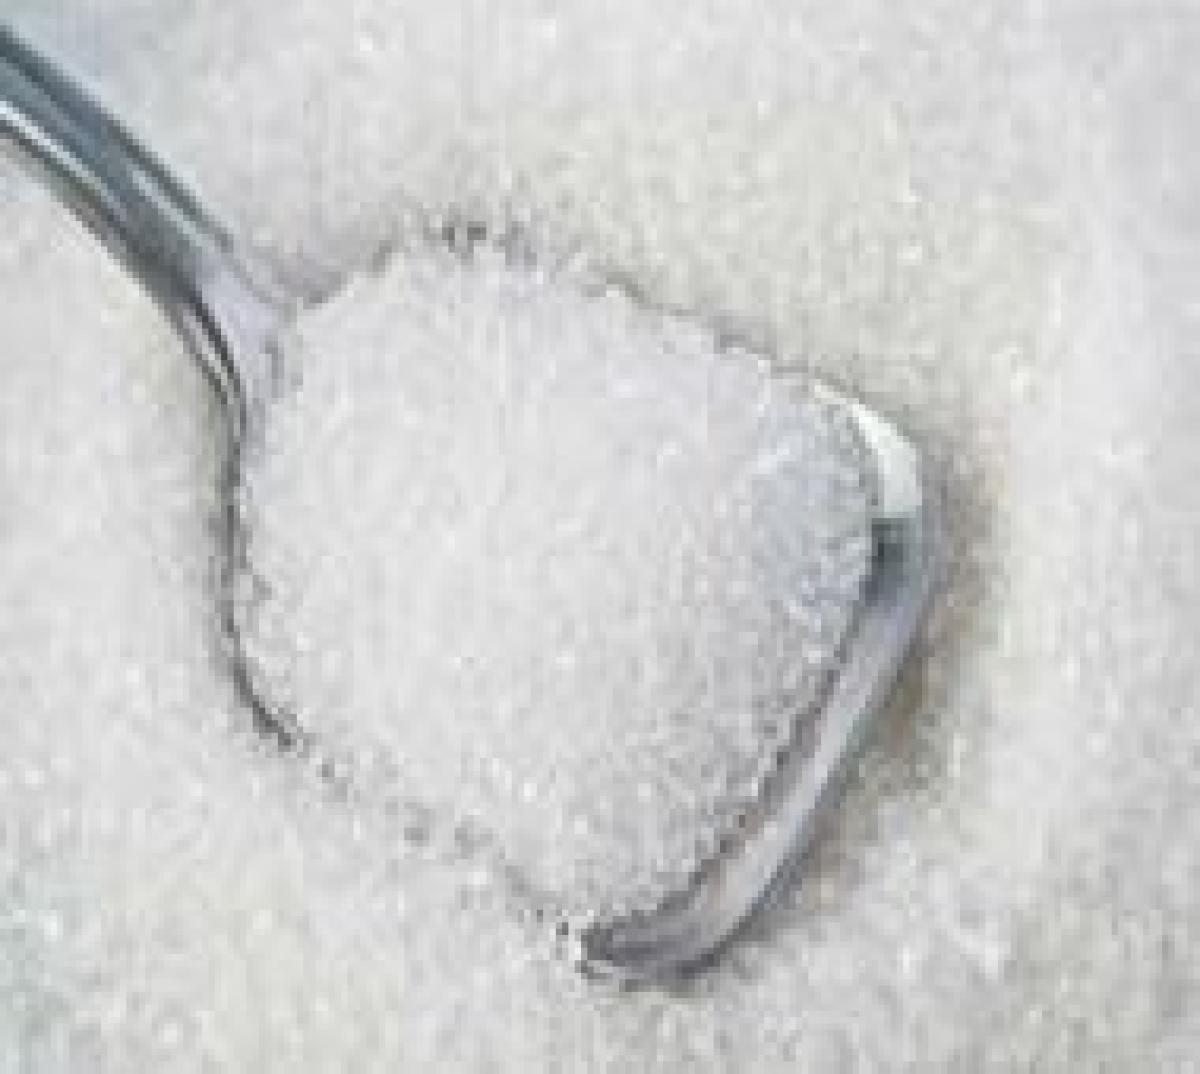 Mumbai: Former minister's sugar mill seized